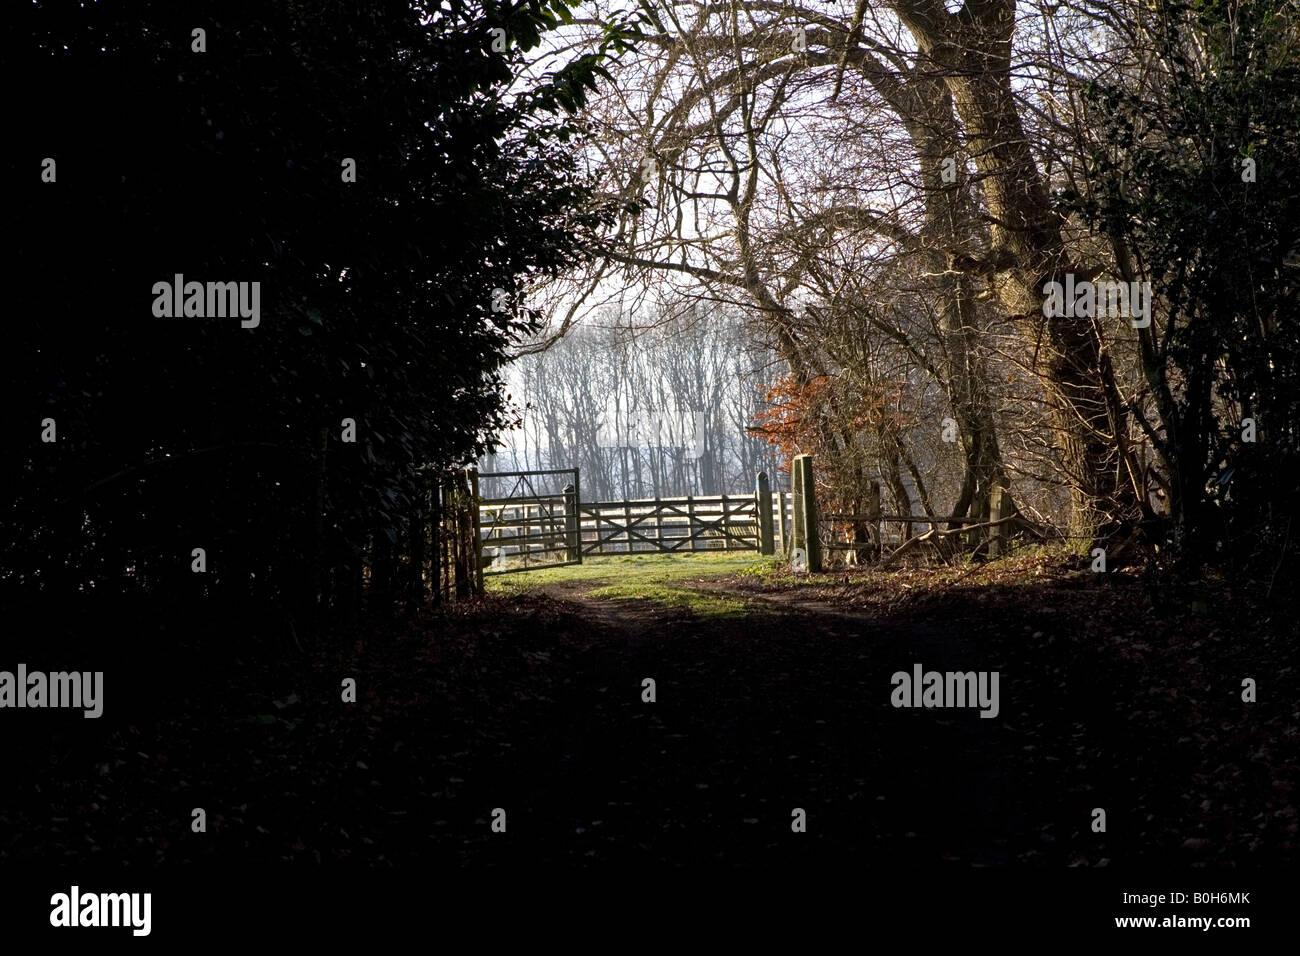 A rural scene in the countryside near Medmenham in Buckinghamshire, England. Stock Photo